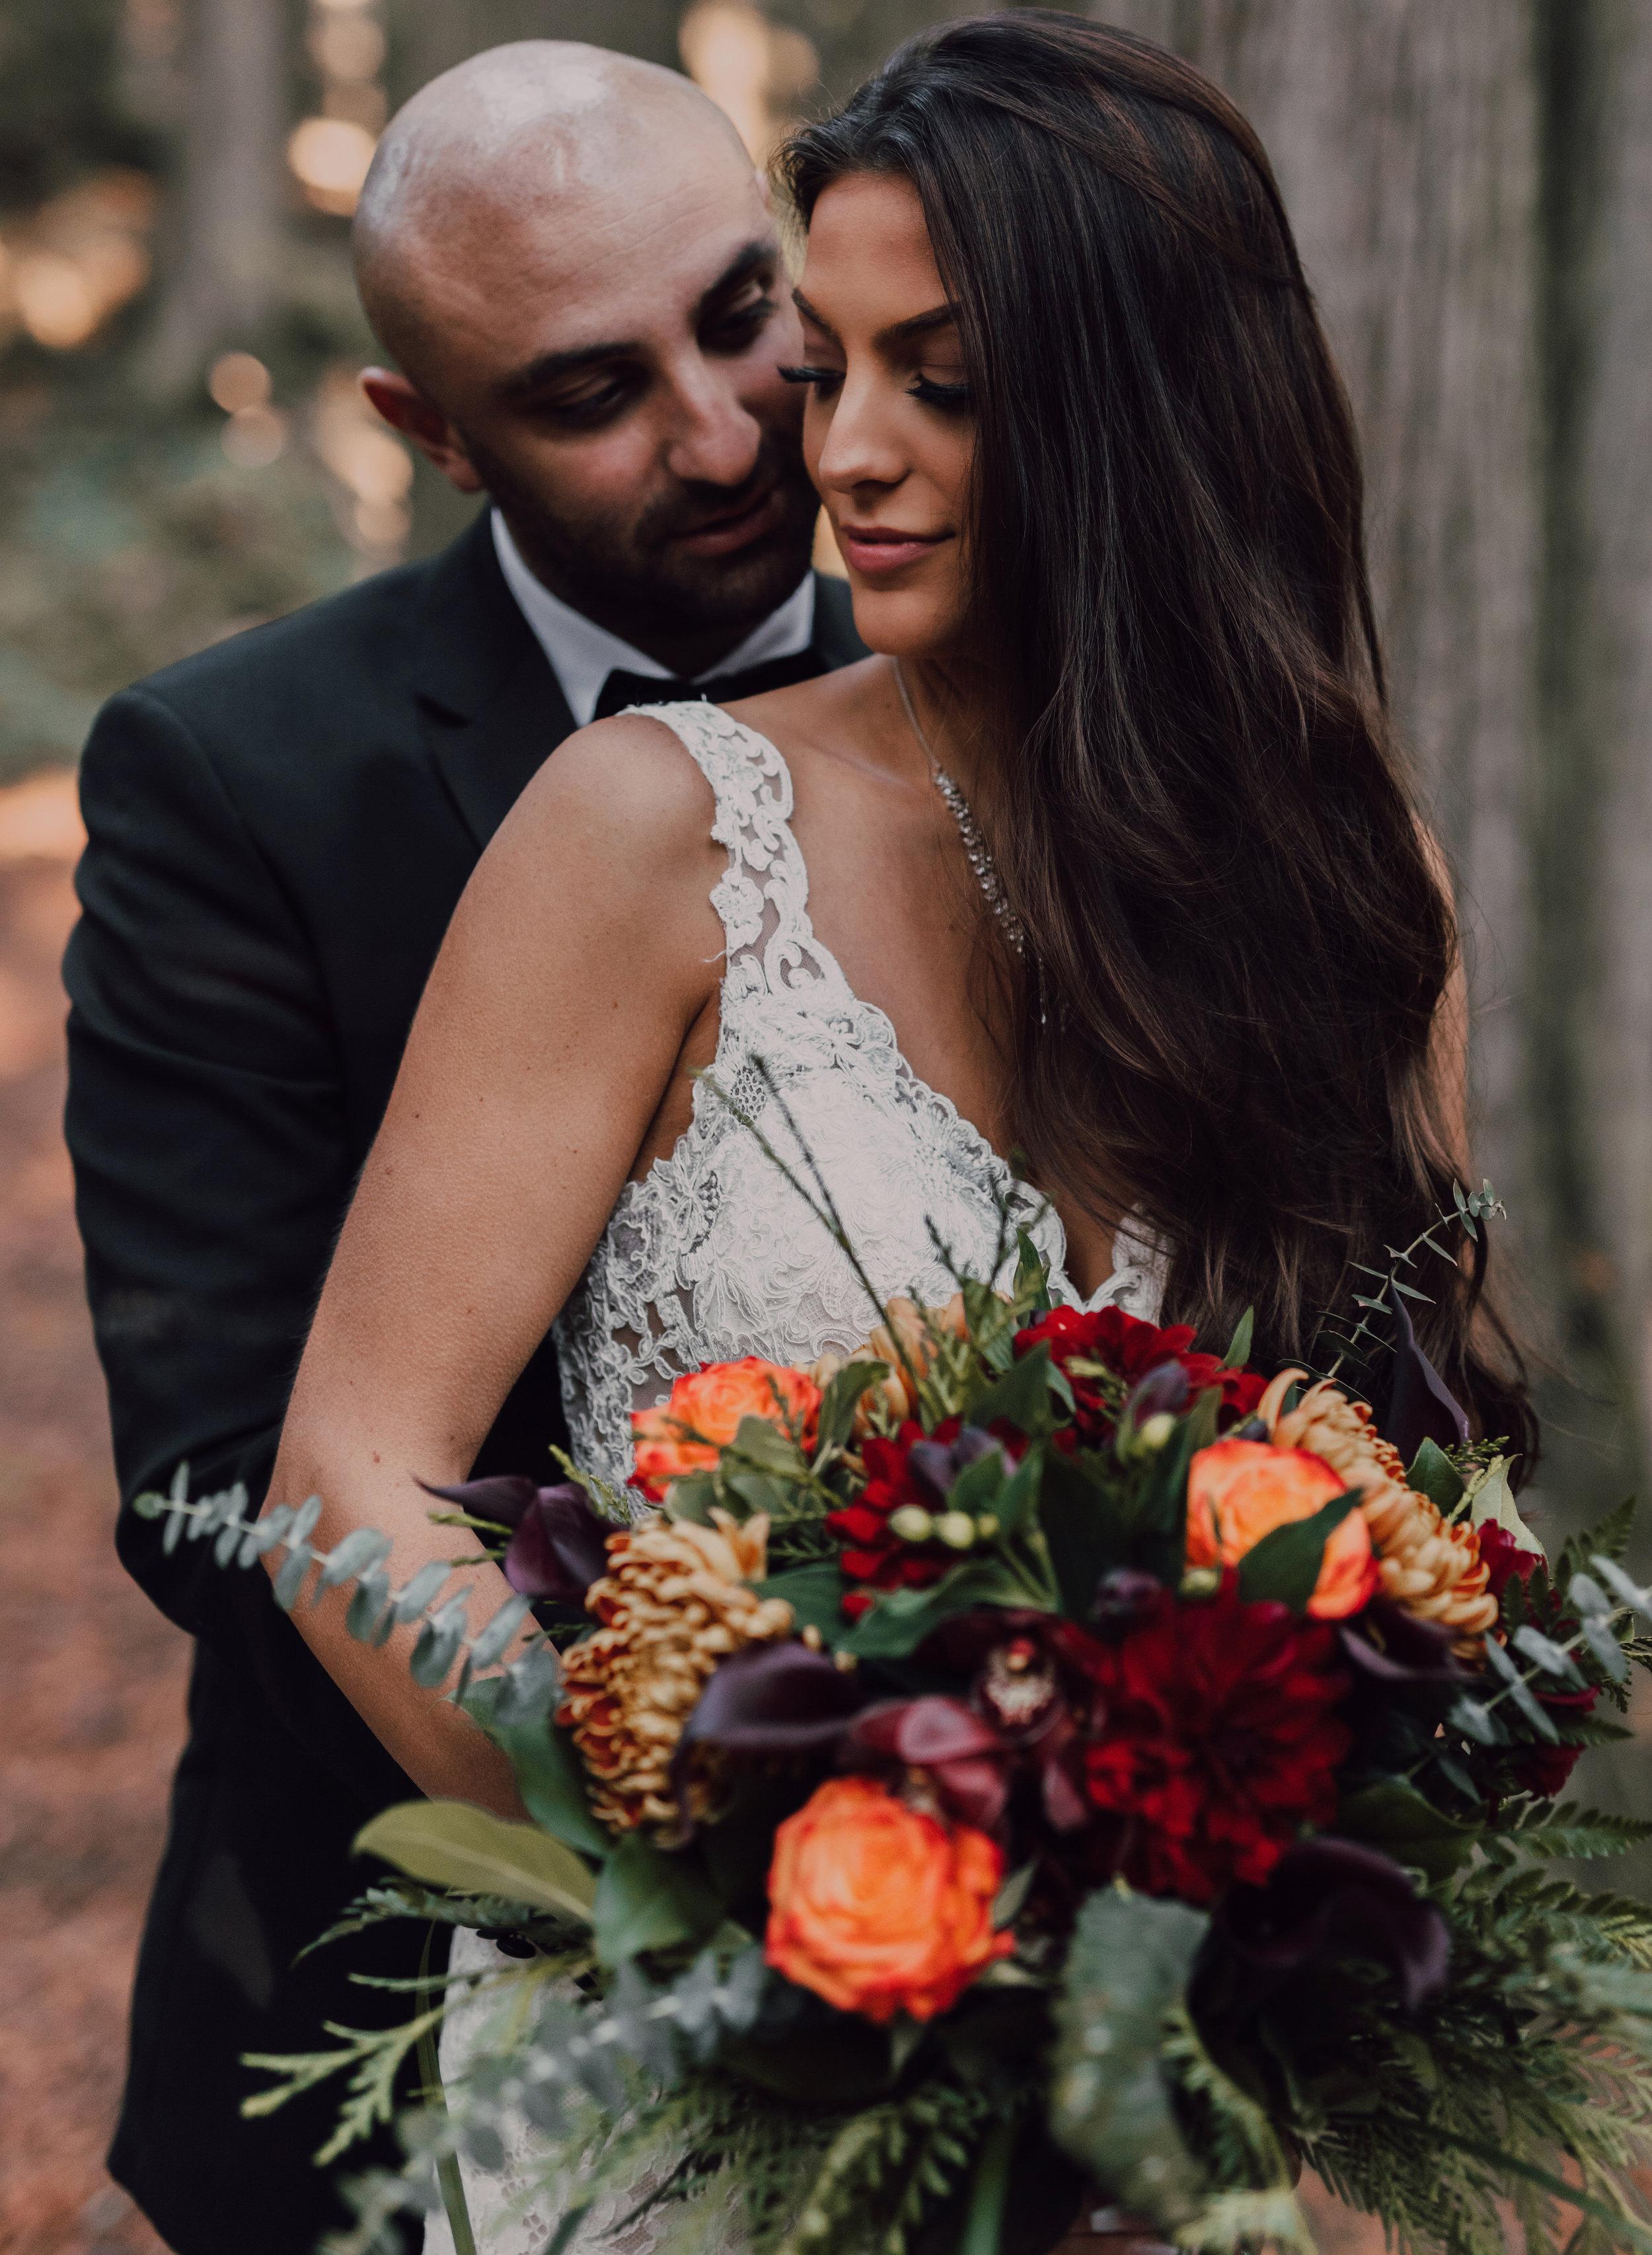 Day After Wedding Photos - Sunshine Coast Wedding Photos - Sunset Wedding Photos - Vancouver Wedding Photographer & Videographer - Sunshine Coast Wedding Photos - Sunshine Coast Wedding Photographer - Jennifer Picard Photography - 1A5A7447.jpg